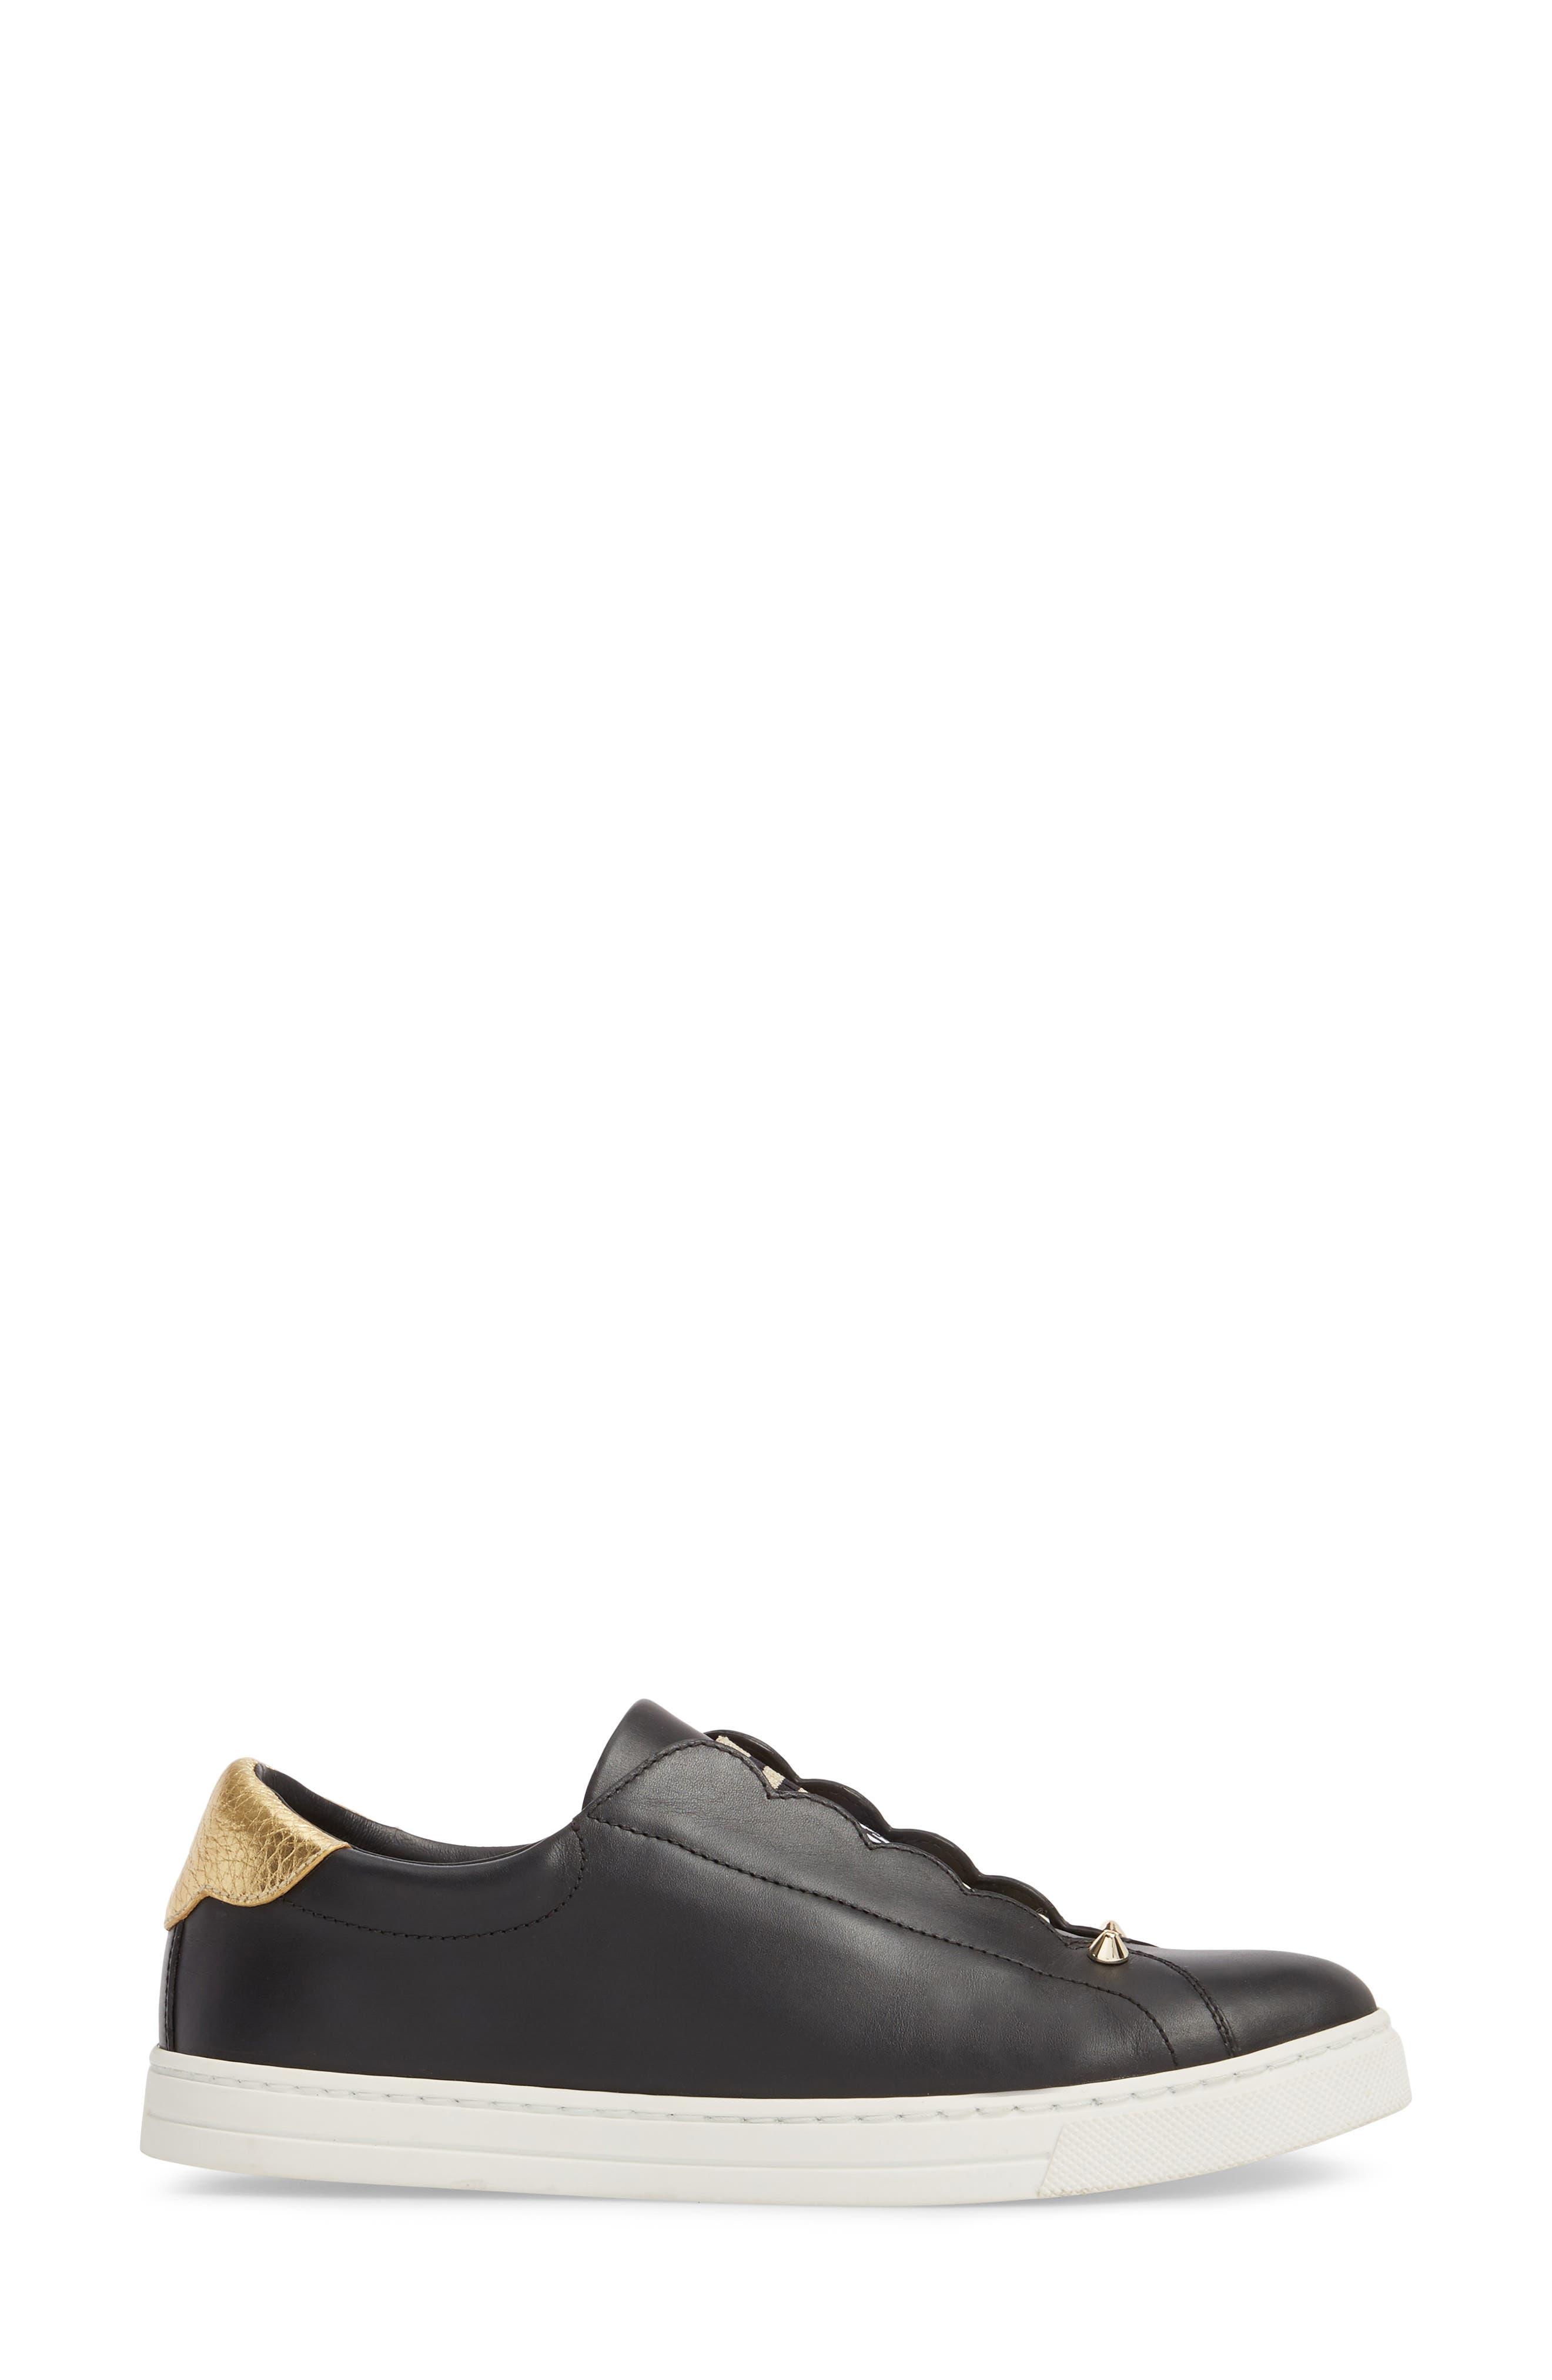 Rockoclick Slip-On Sneaker,                             Alternate thumbnail 3, color,                             BLACK